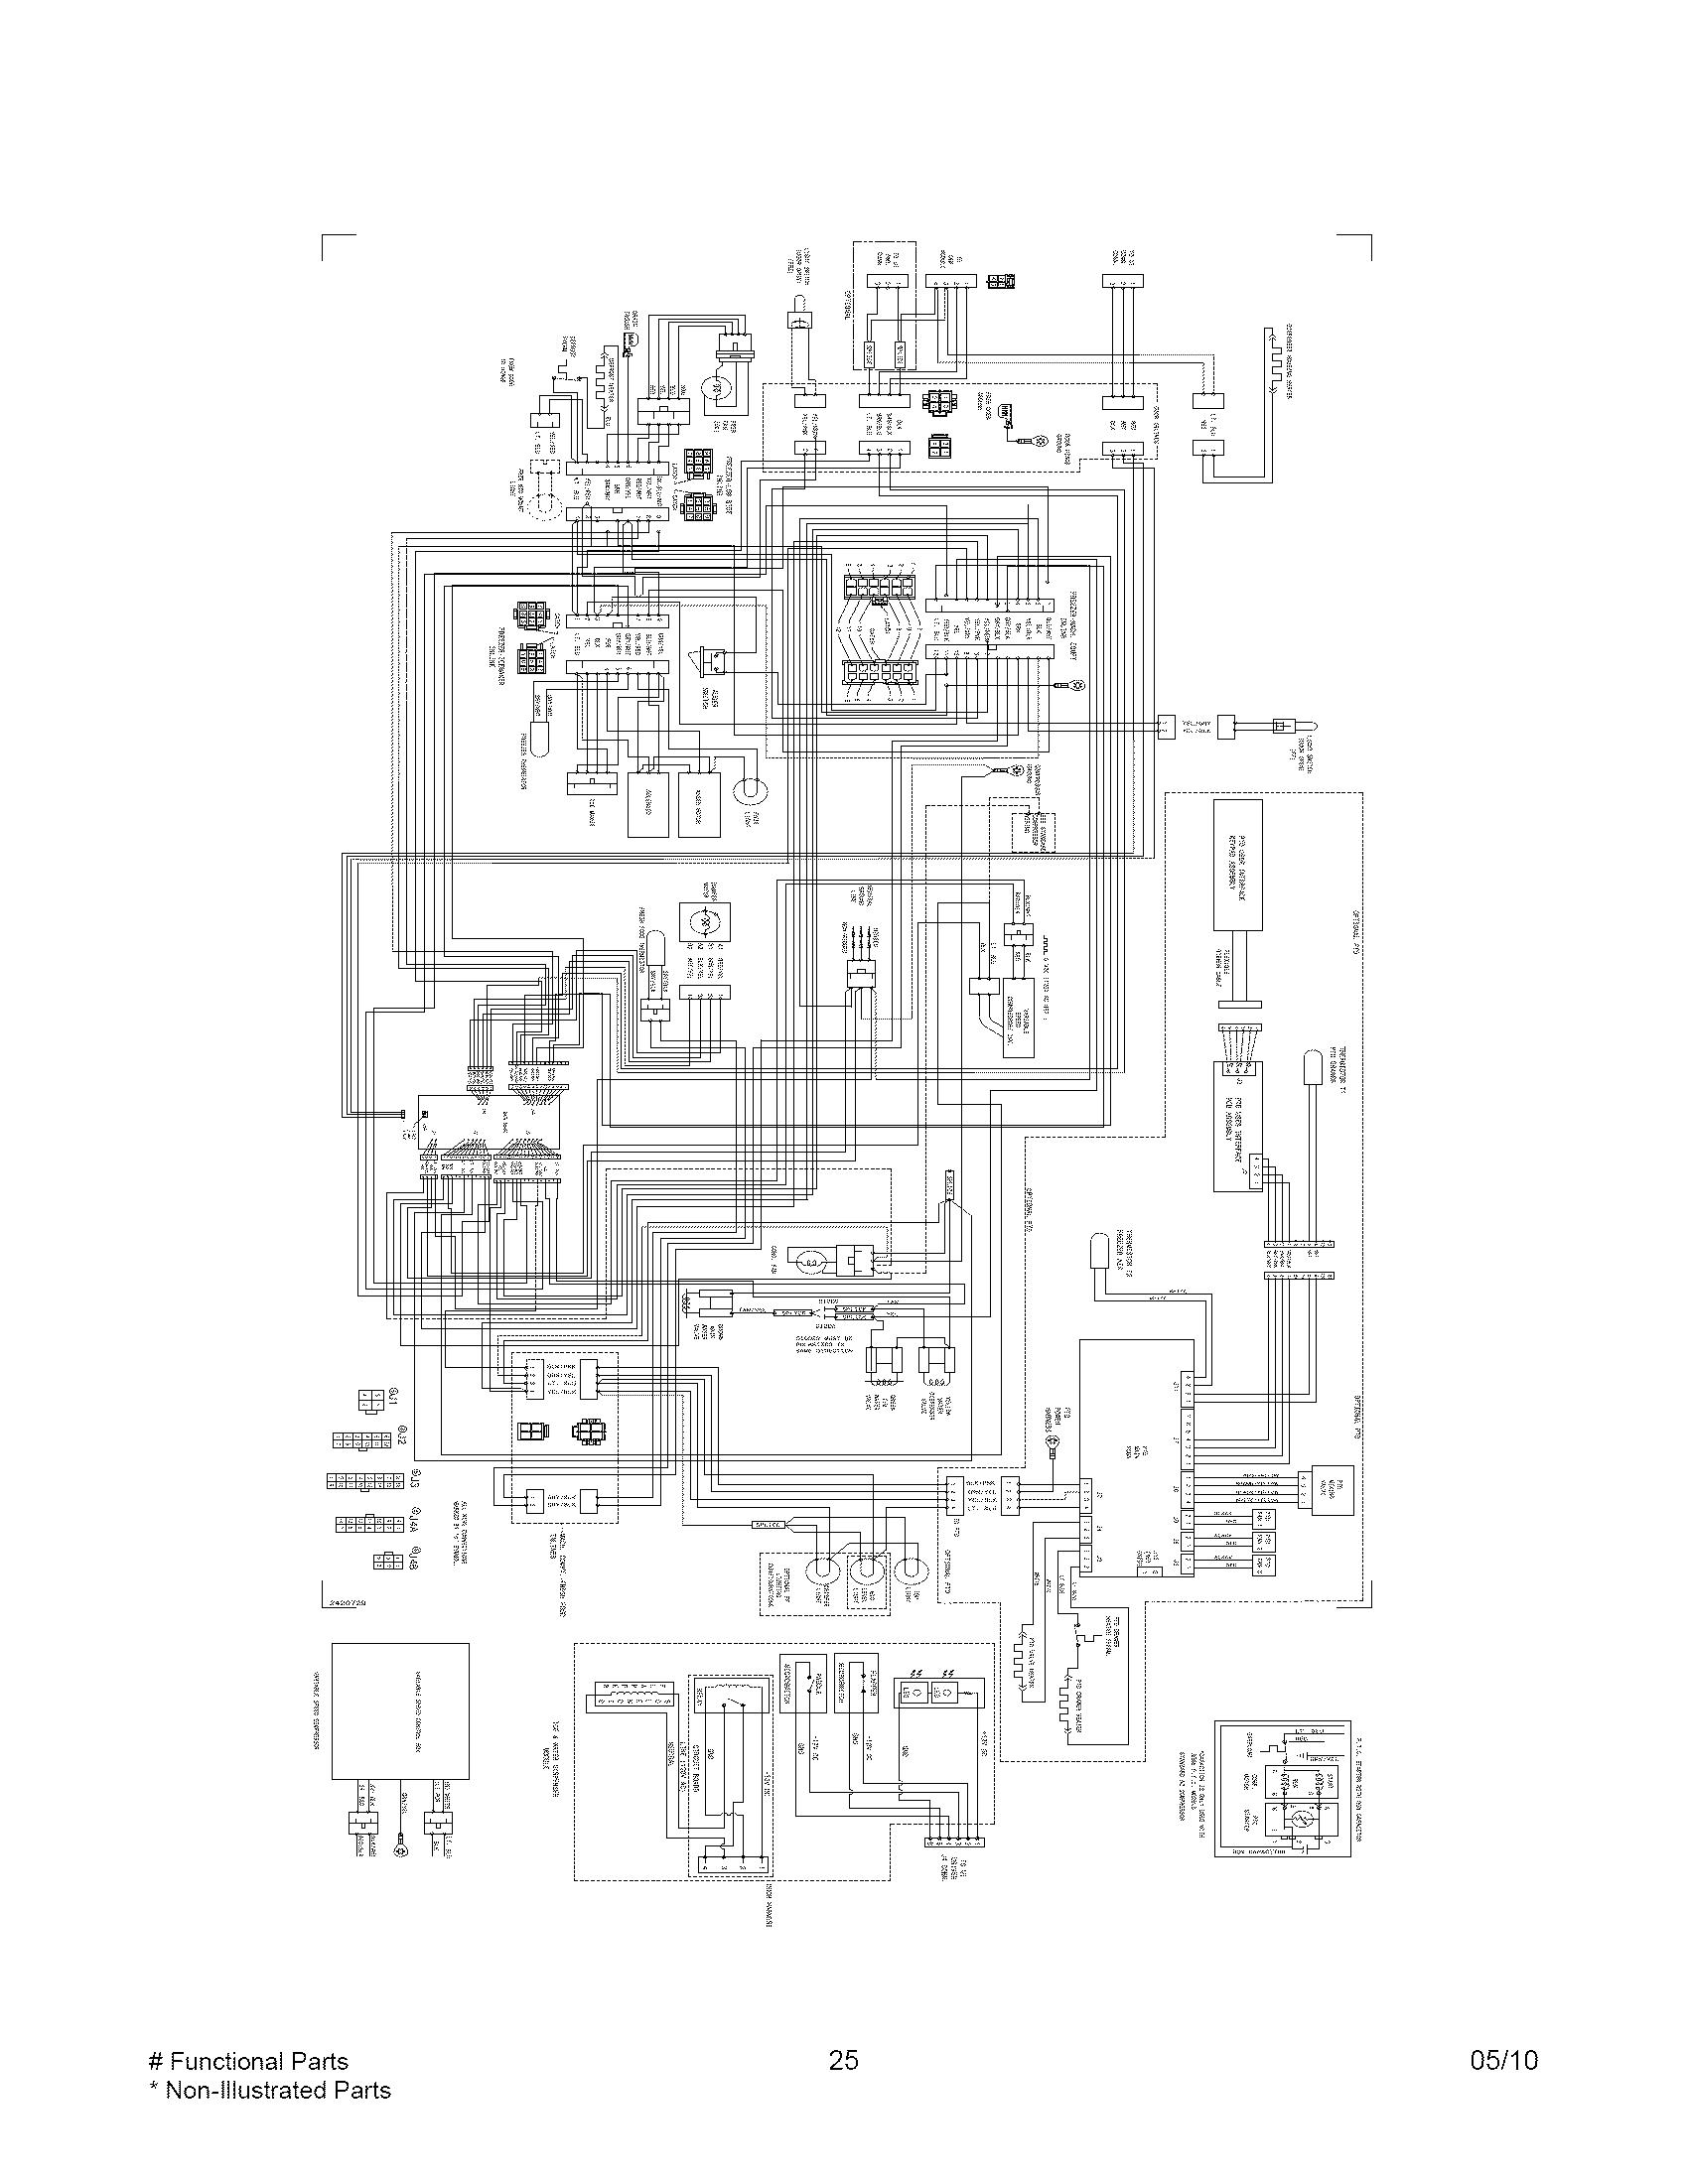 hight resolution of refrigerator wiring diagram on electrolux refrigerator wiring diagrams